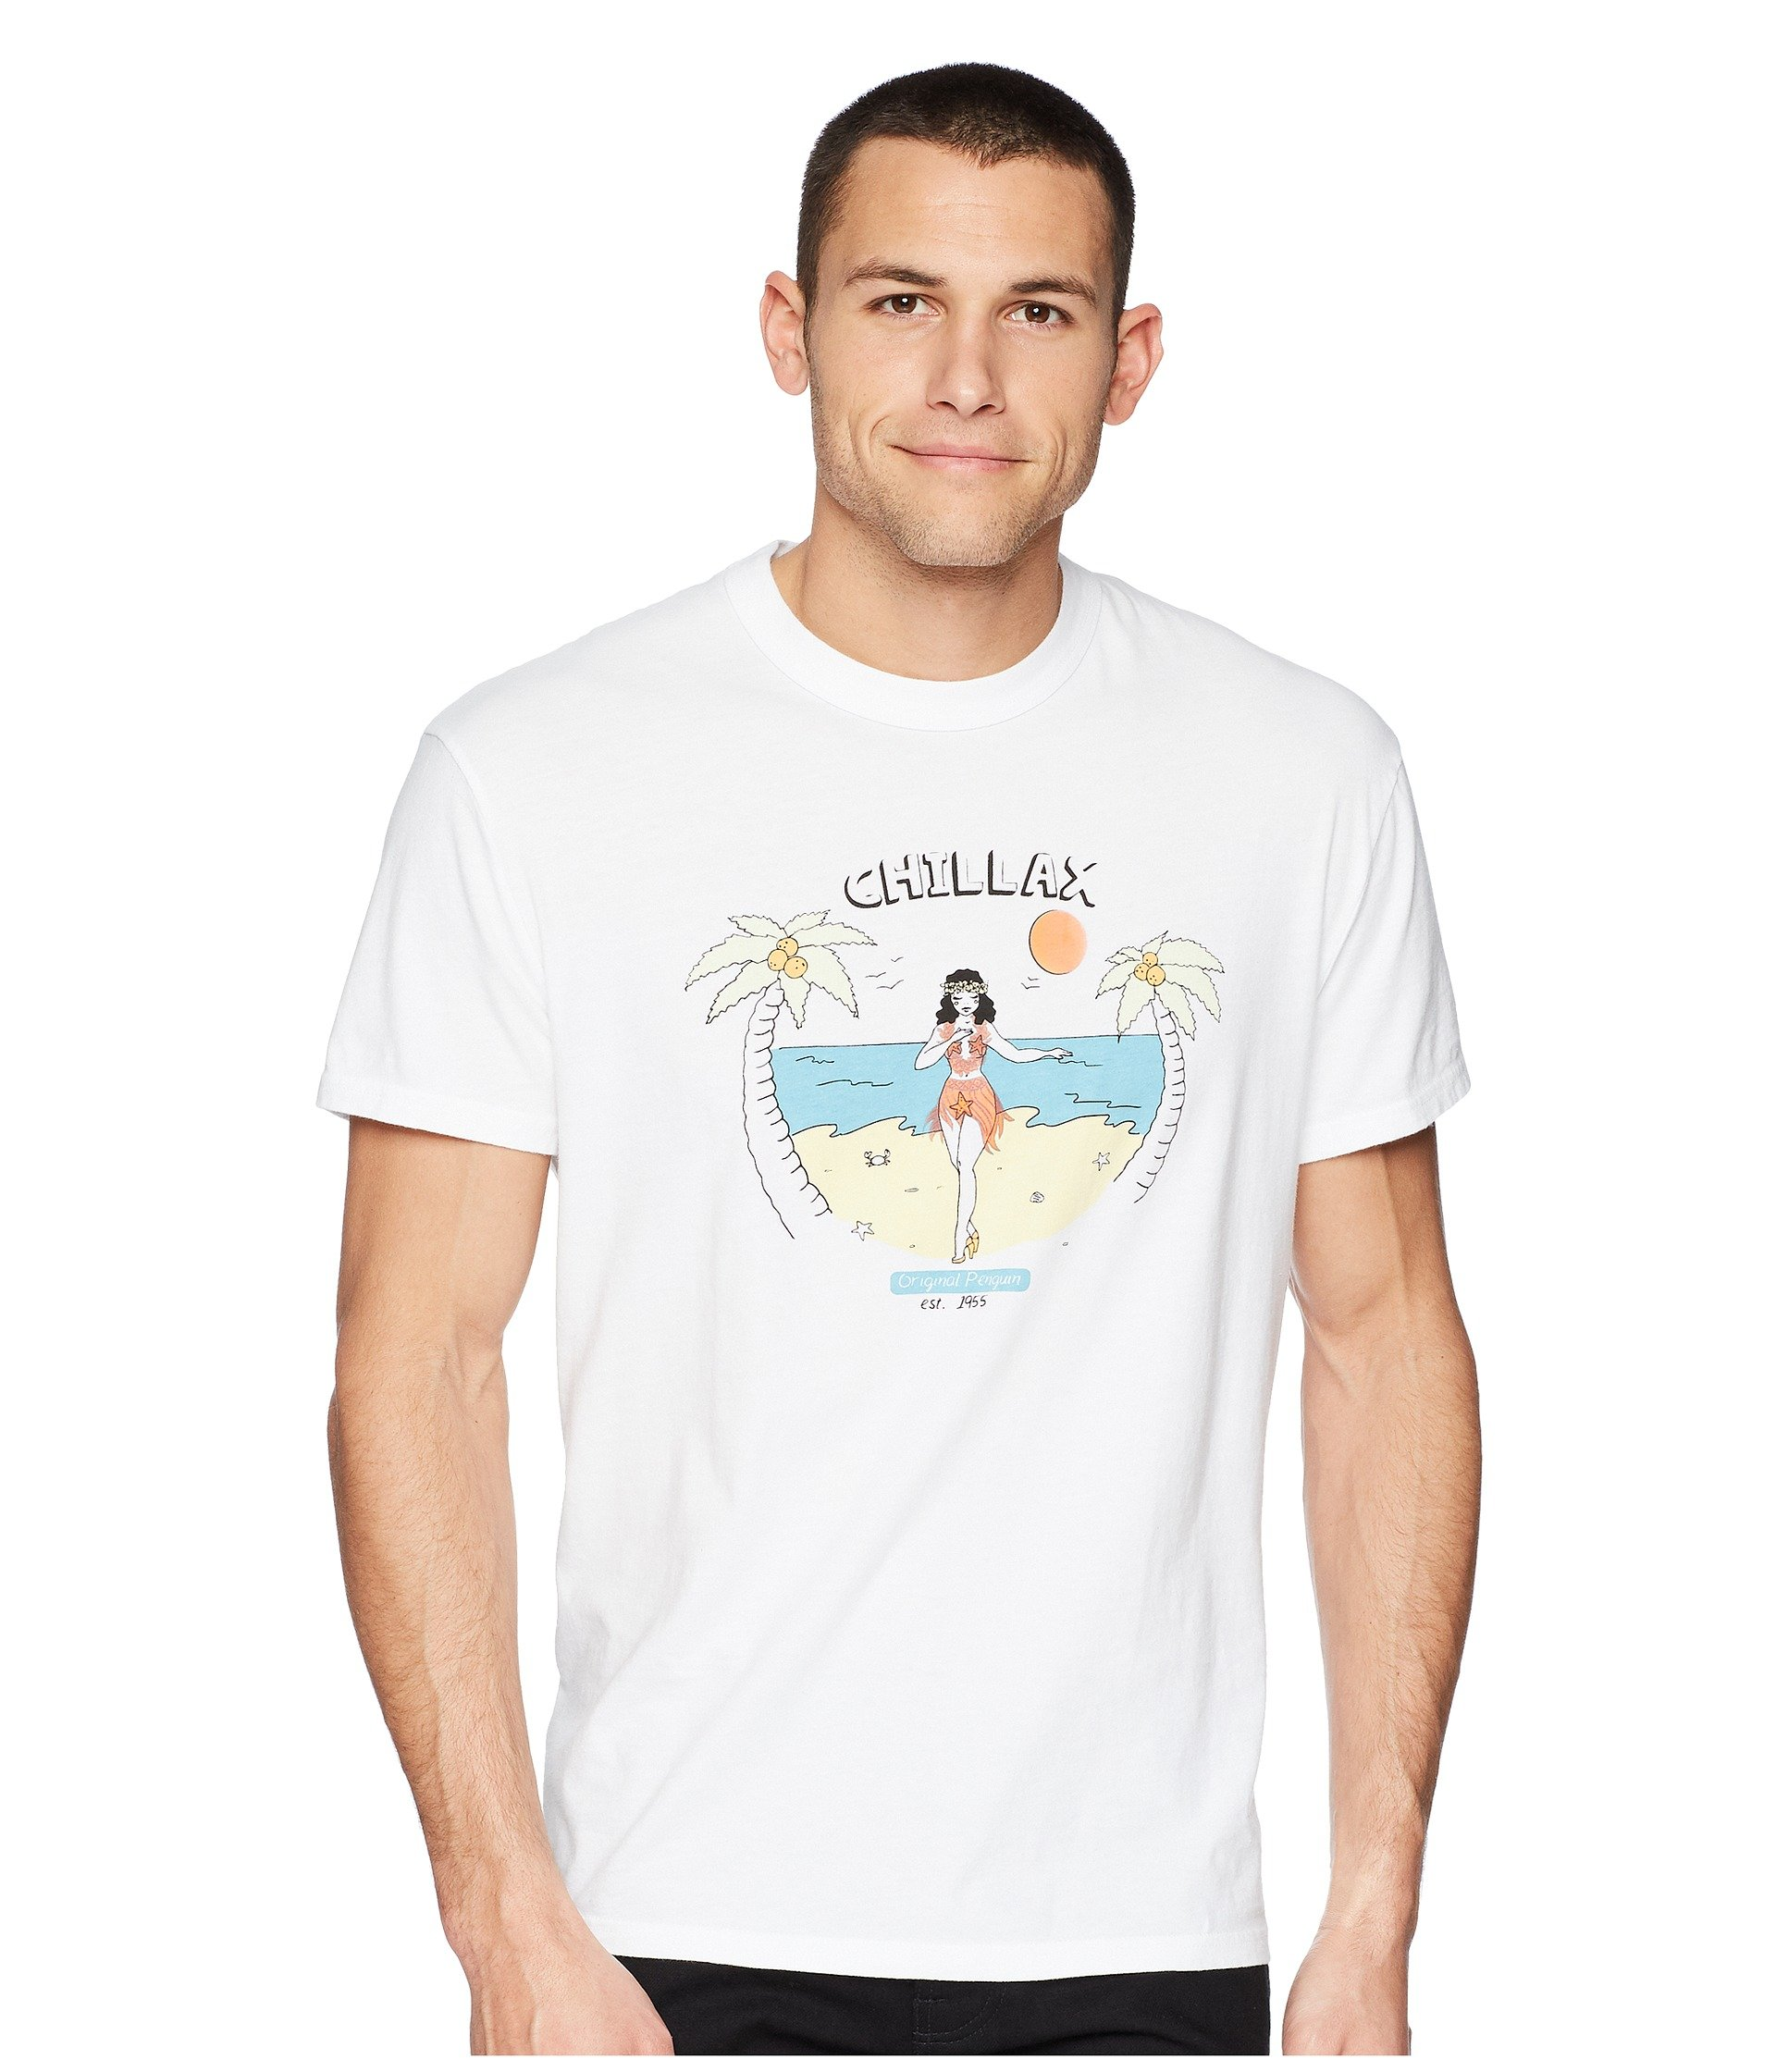 Camiseta para Hombre Original Penguin Chillax T-Shirt  + Original Penguin en VeoyCompro.net